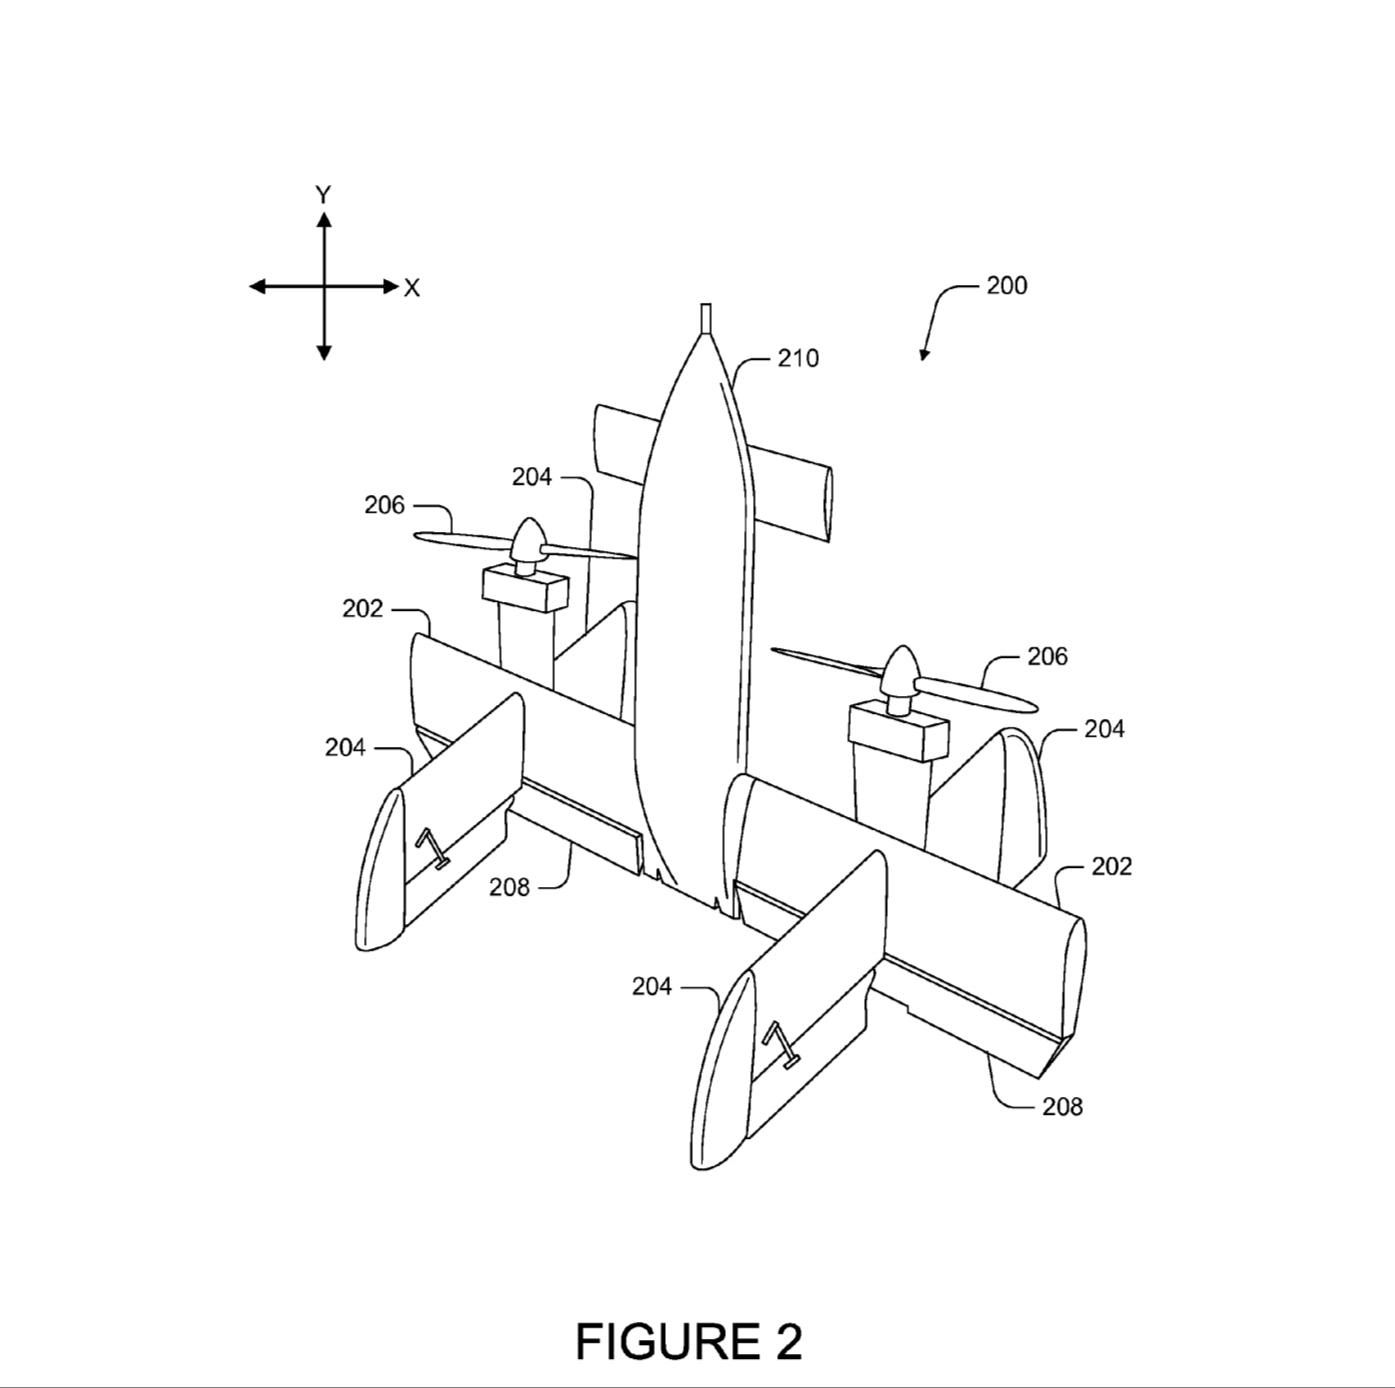 Drone design to fetch medial eqipment